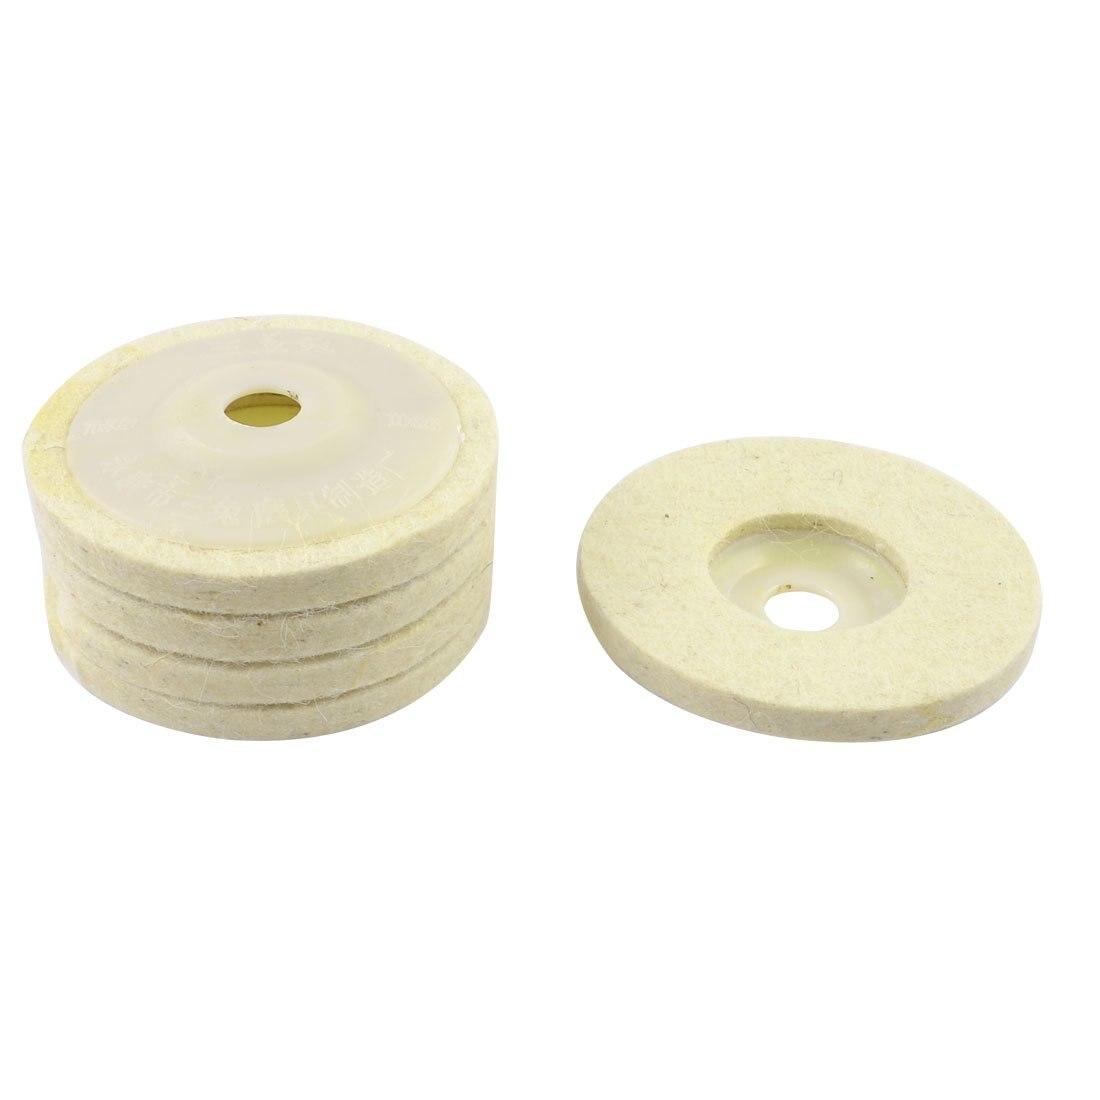 5 Pcs Off White Wool Felt Polishing Disc Wheel Pad 100mm x 10mm x 16mm